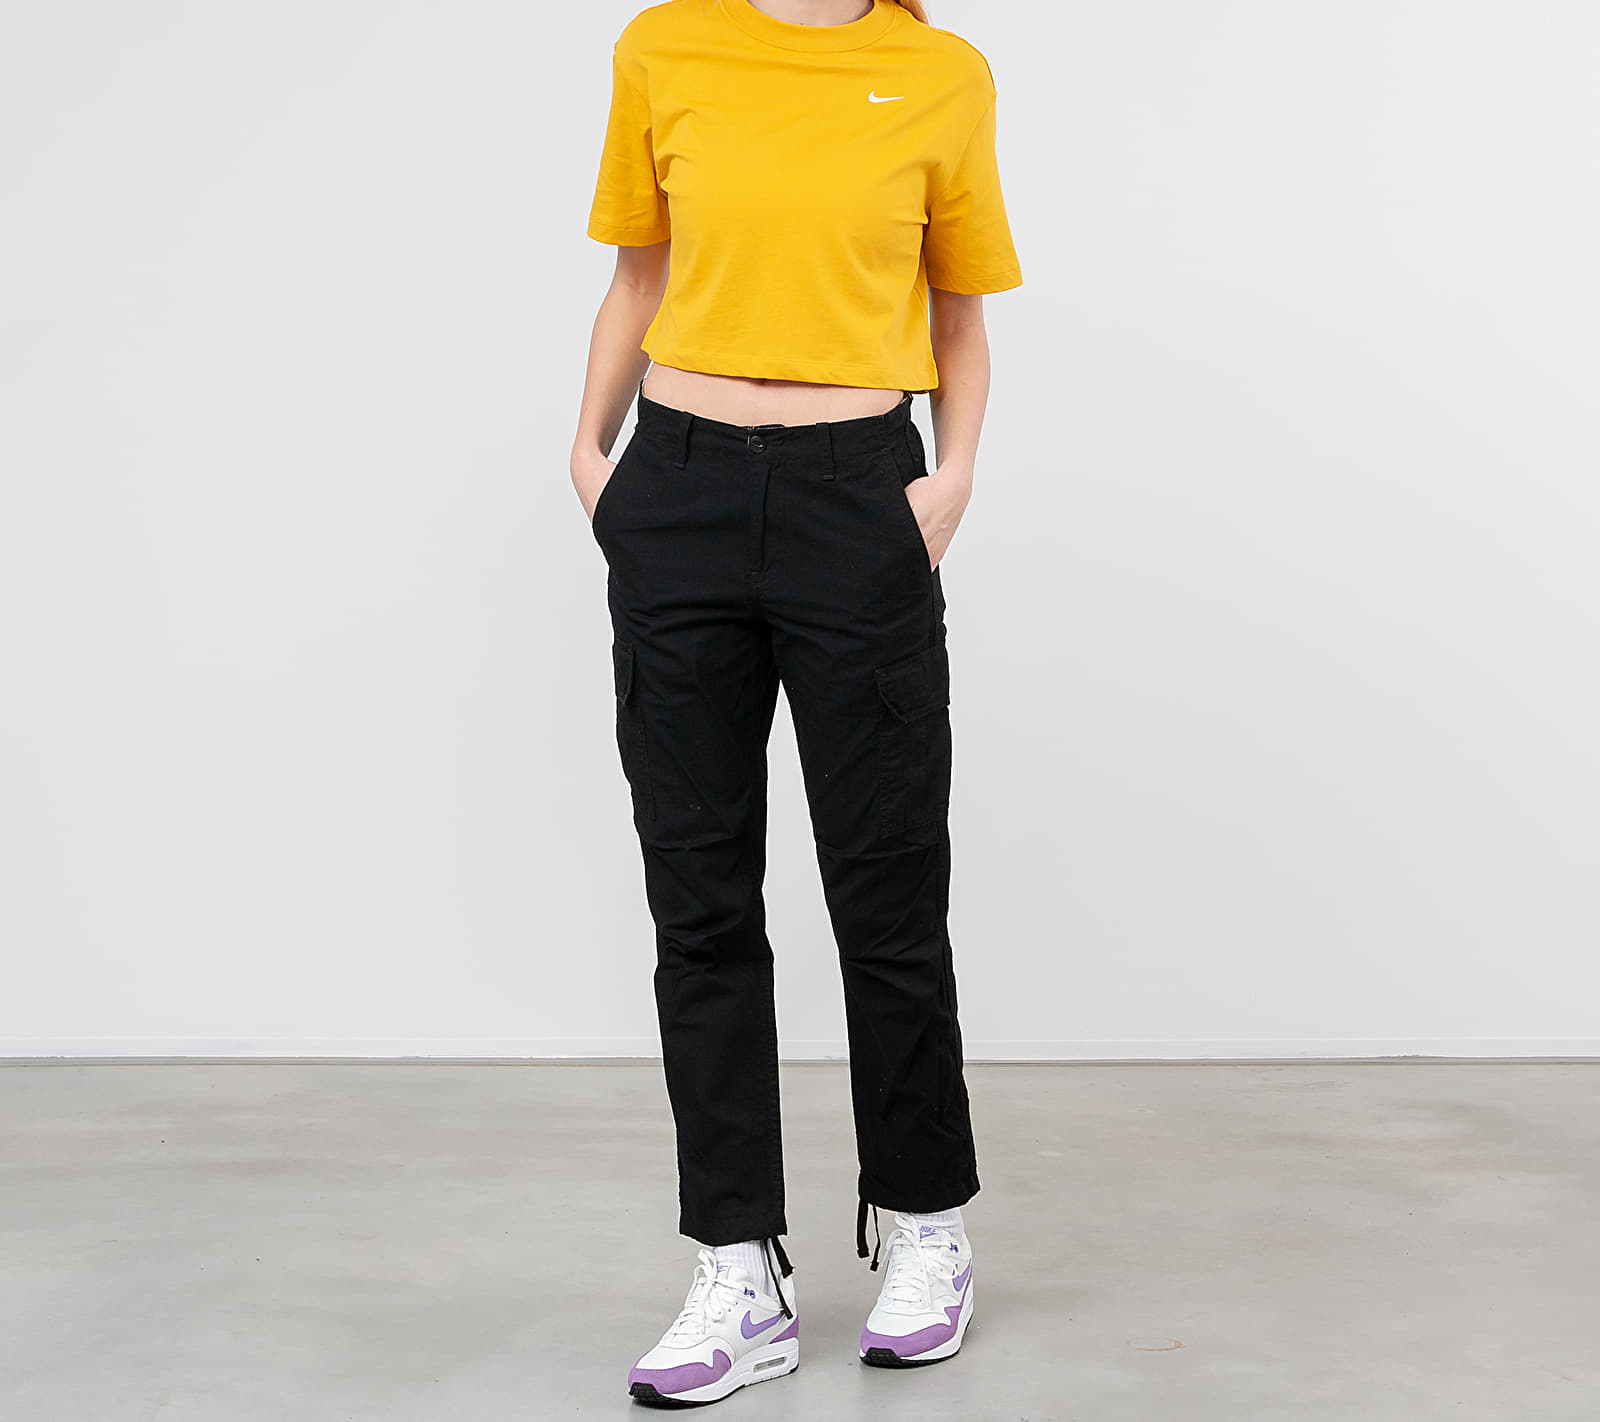 Nike Sportswear Essential Top Dark Sulfur/ White, Yellow